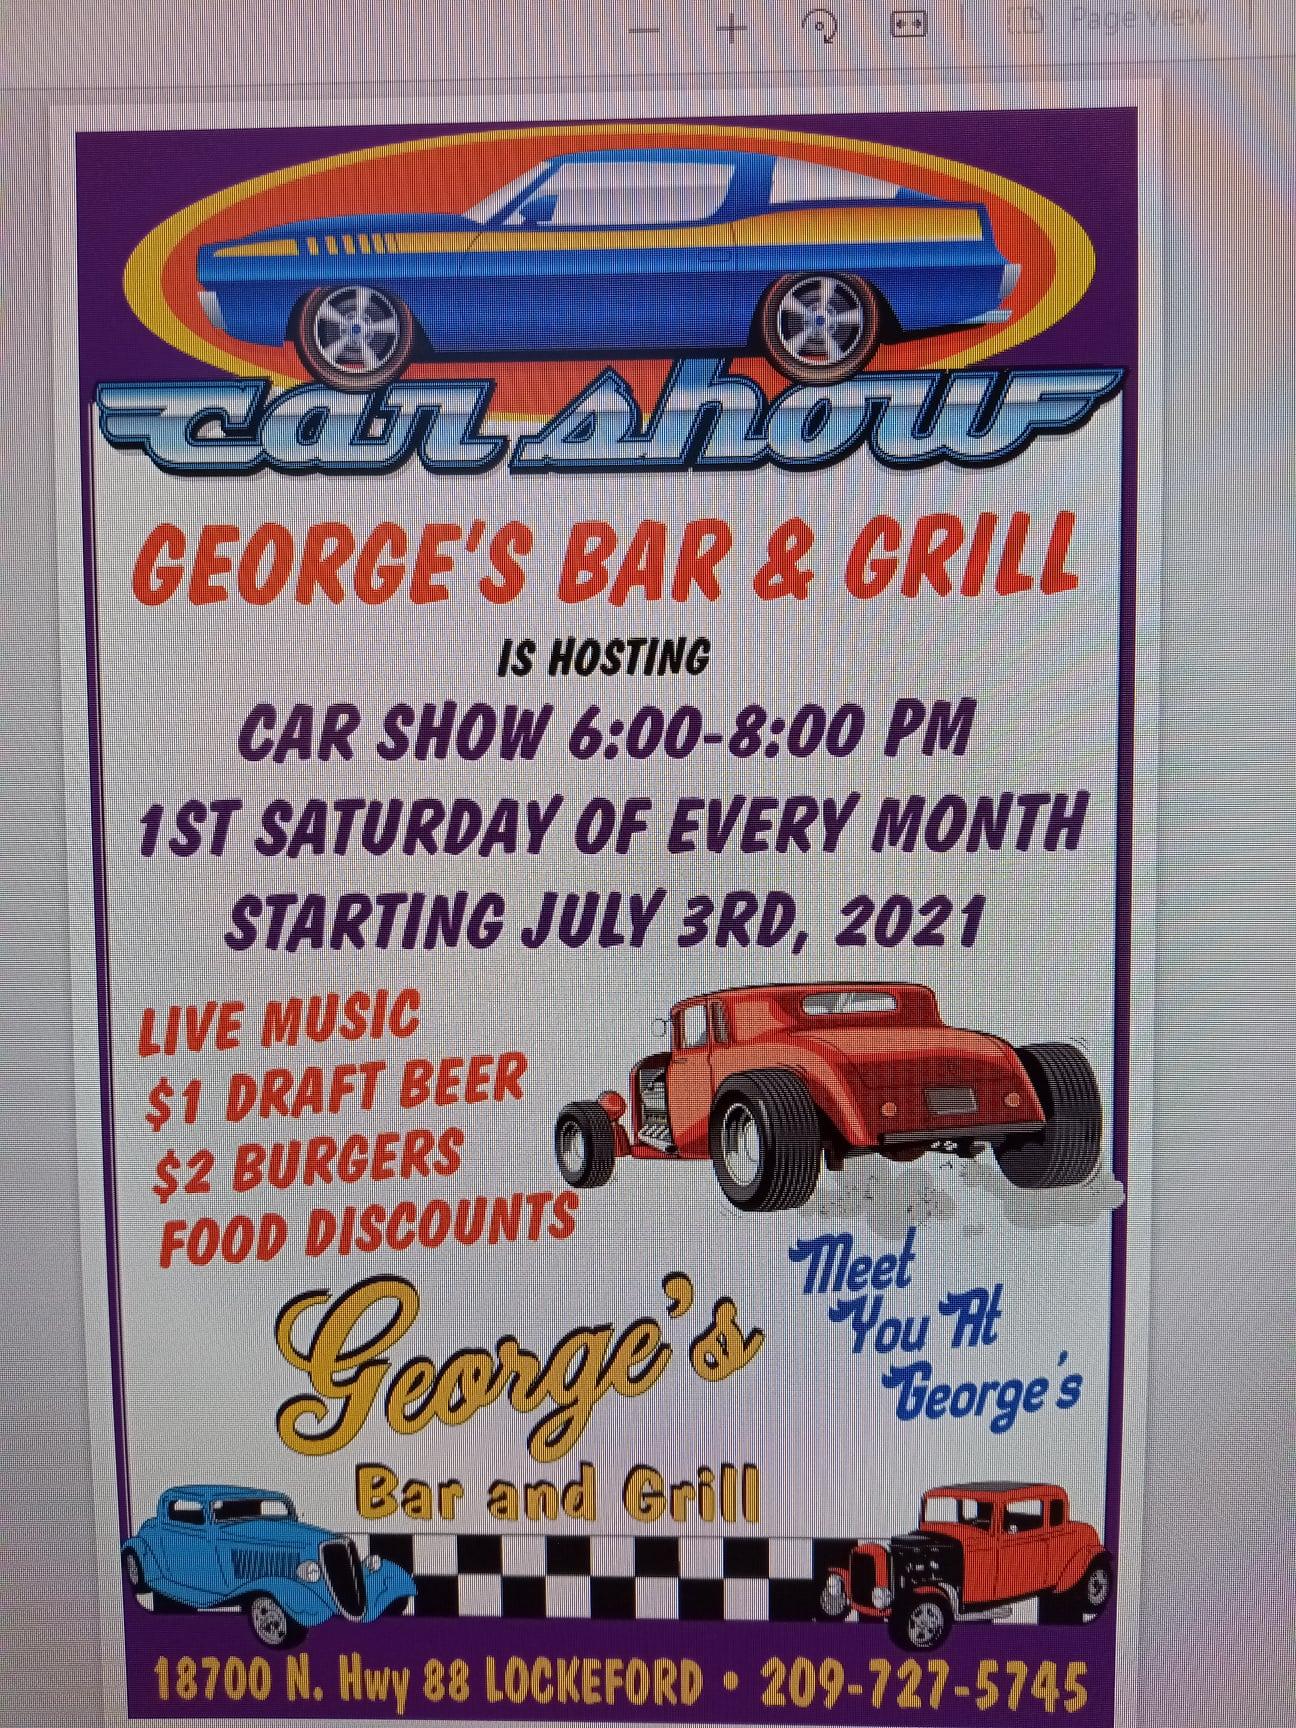 George's Bar & Grill Car Show